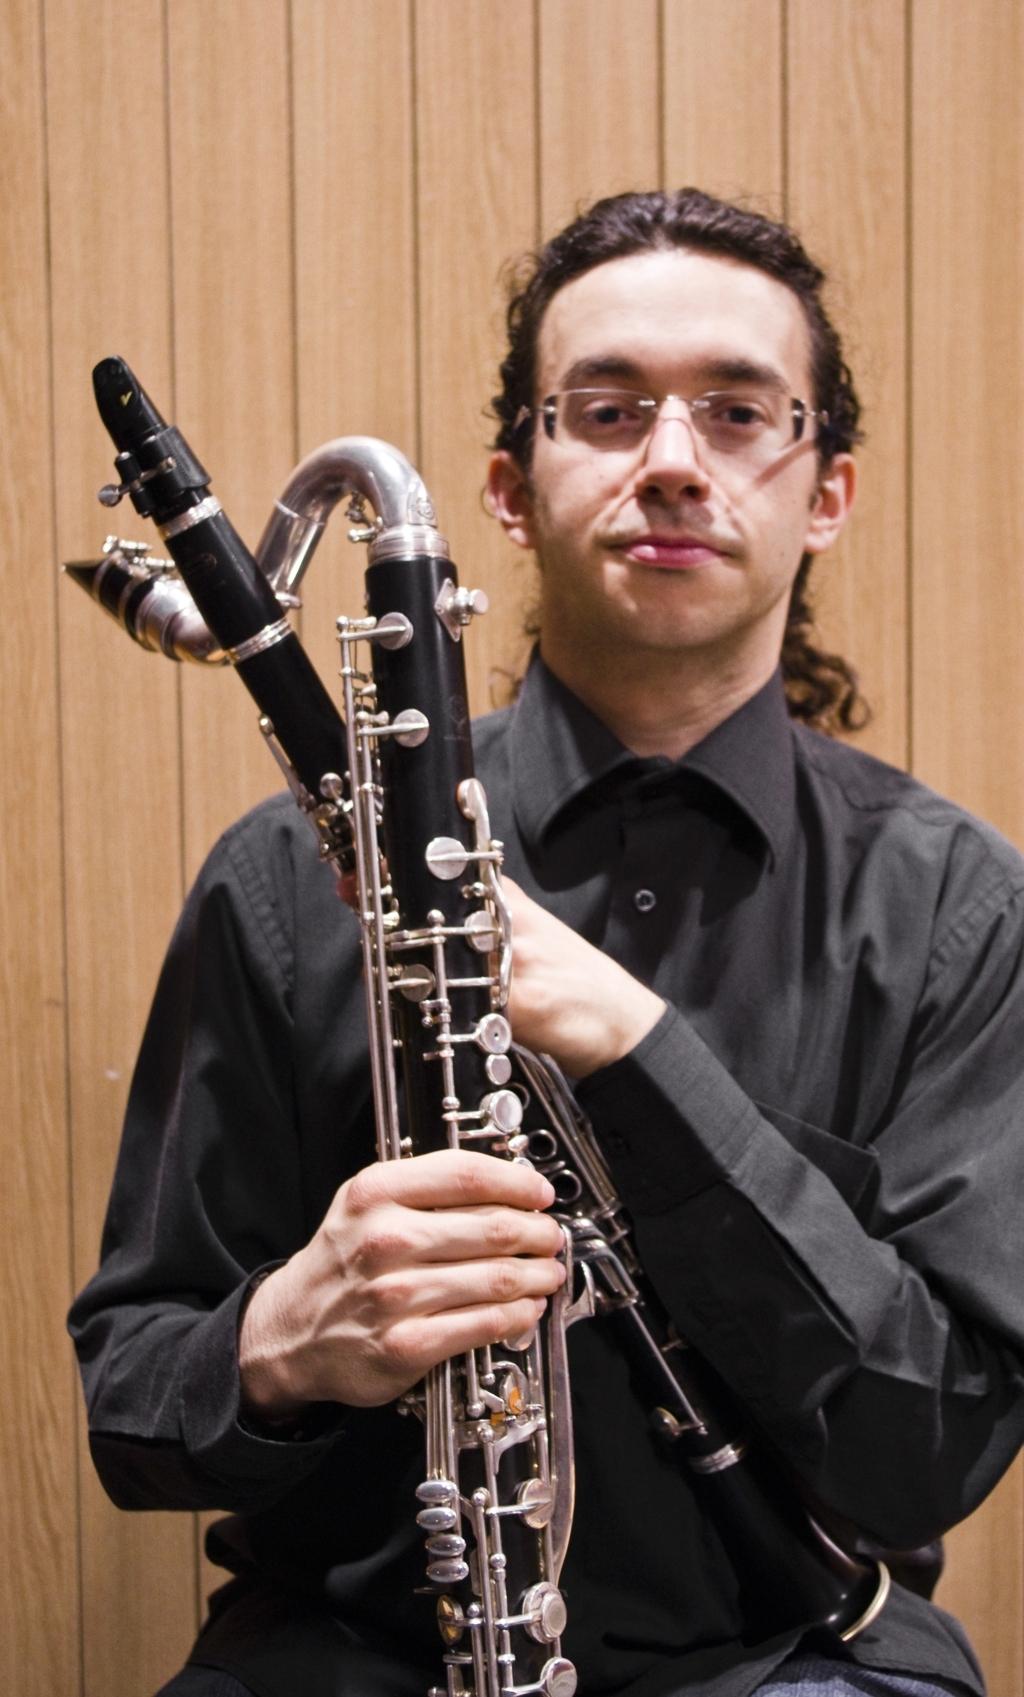 Saul Carraro